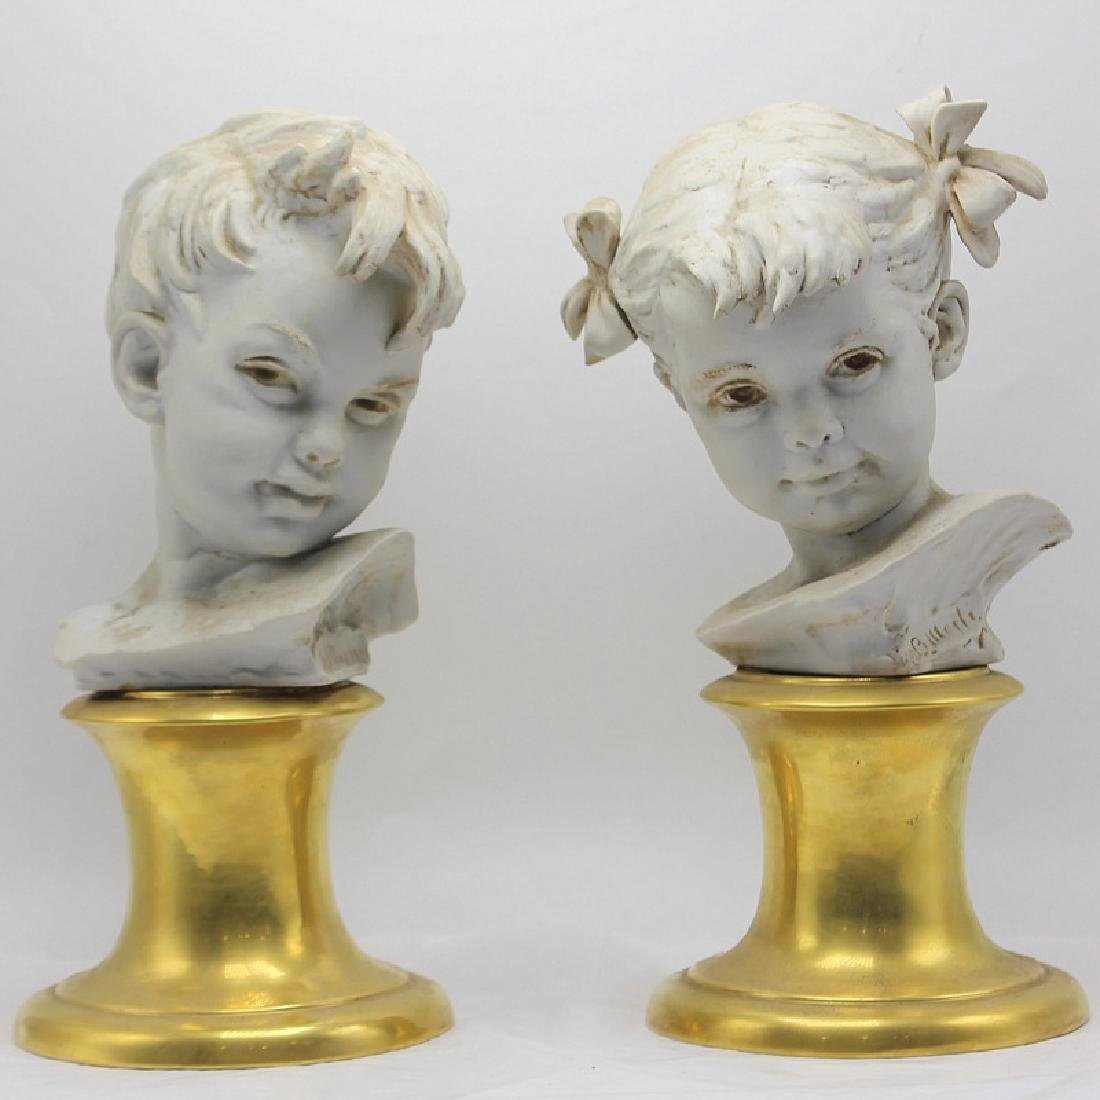 Italian Porcelain Busts - 2